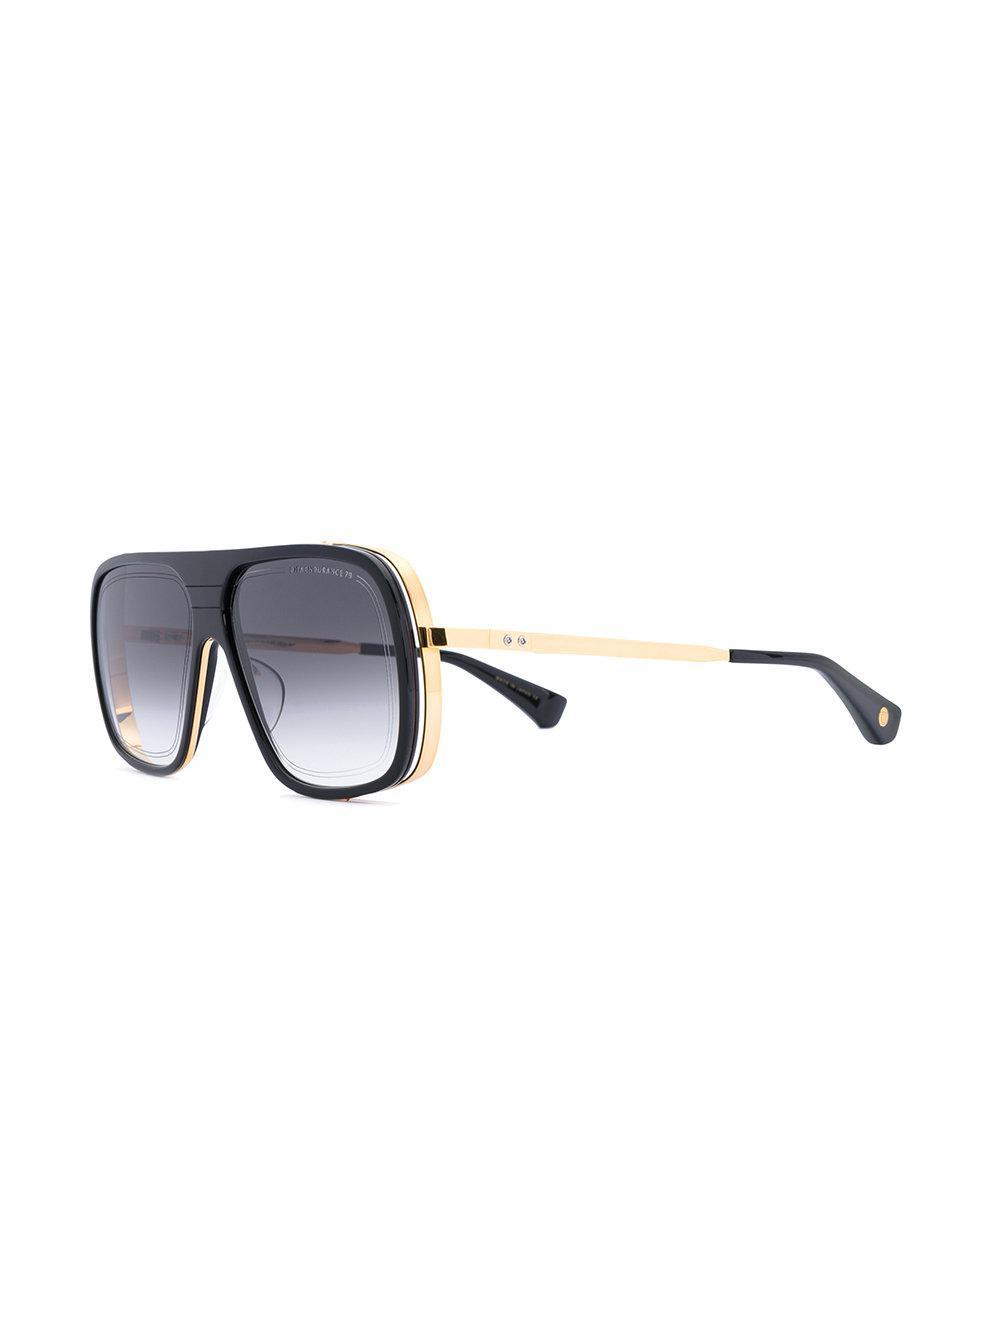 1401c678767b Lyst - Dita Eyewear Gold Trim Oversized Sunglasses in Black